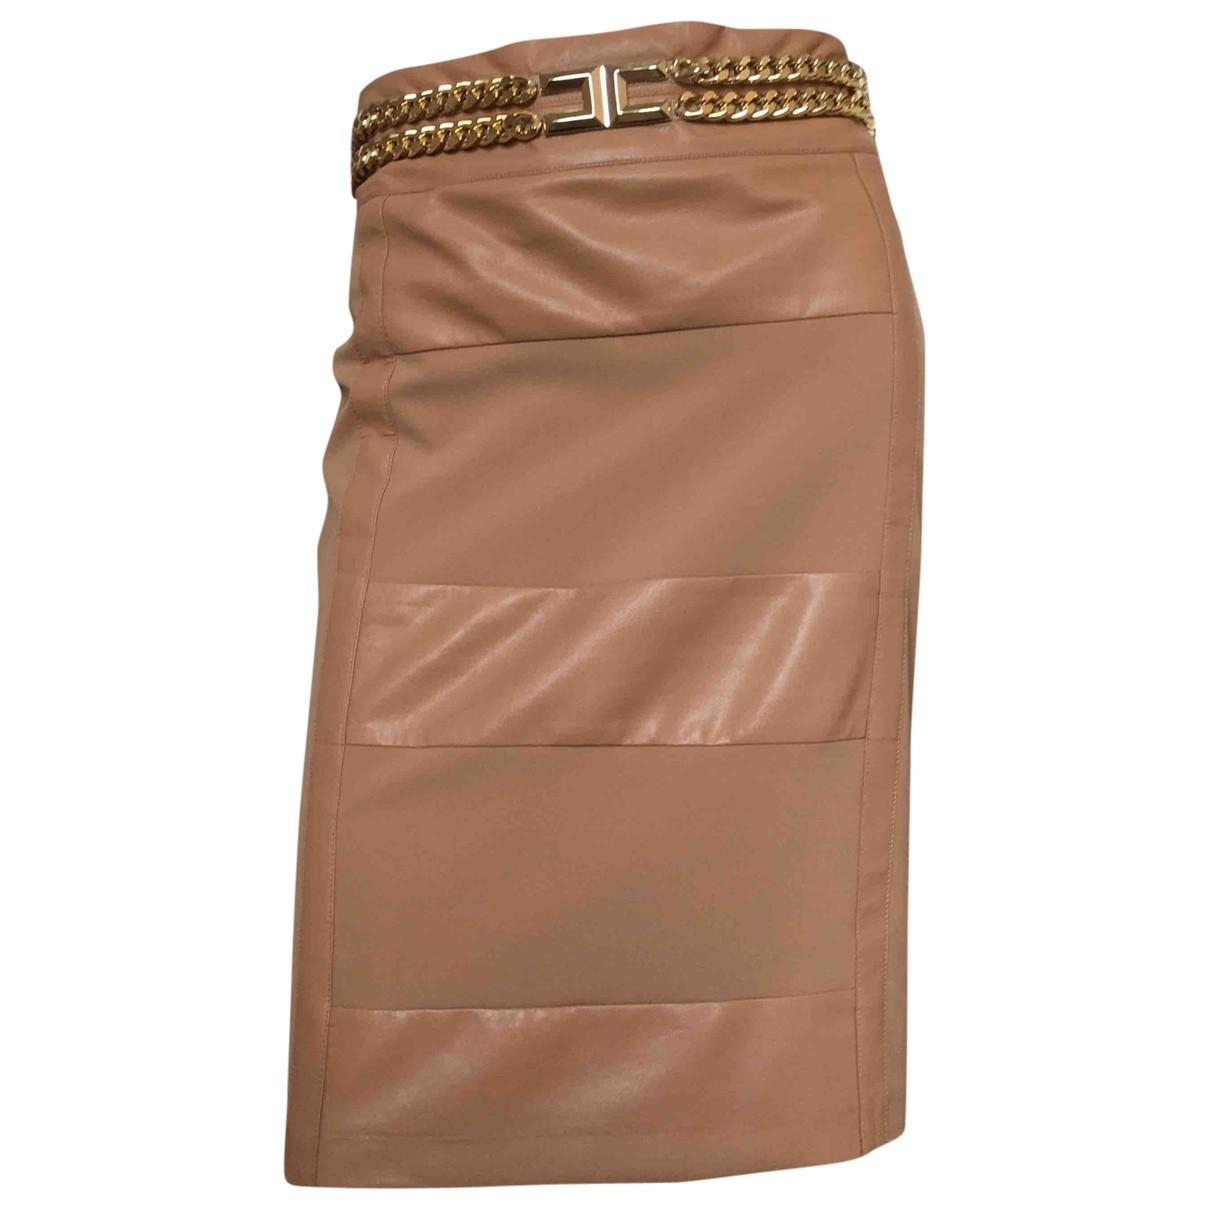 Elisabetta Franchi \N Beige skirt for Women 44 IT